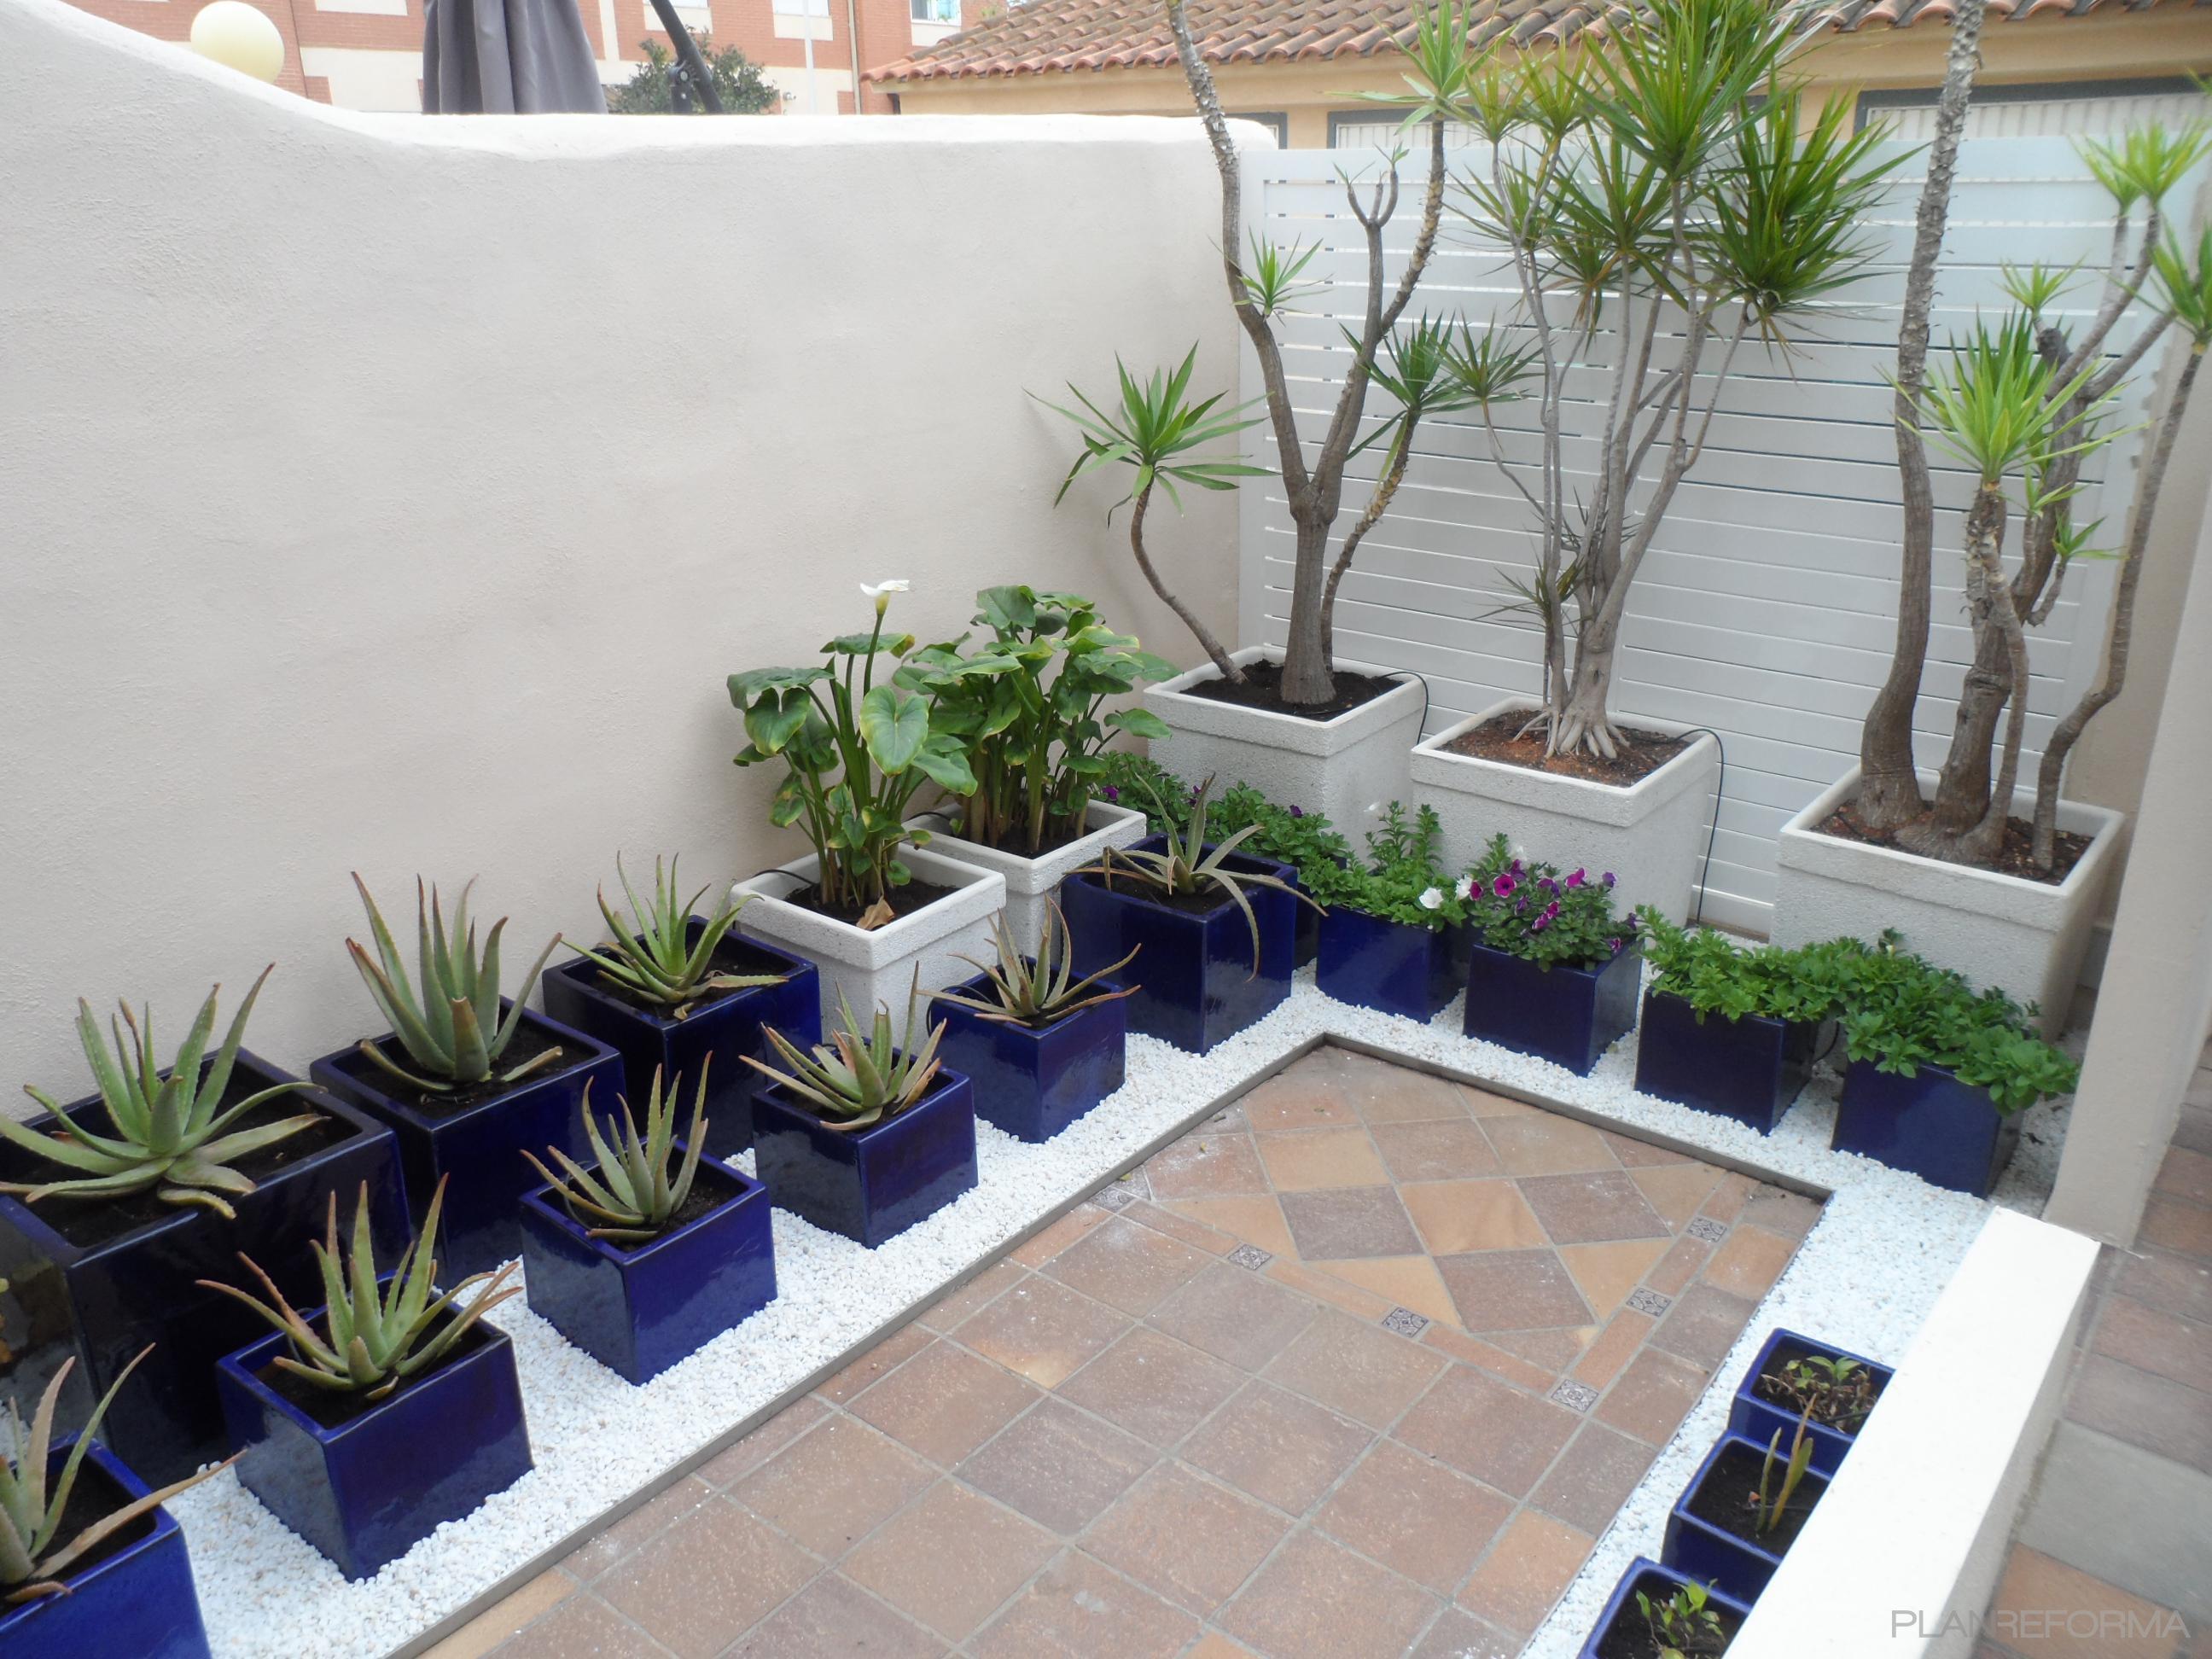 Exterior jardin style contemporaneo color verde azul - Maceteros de obra ...